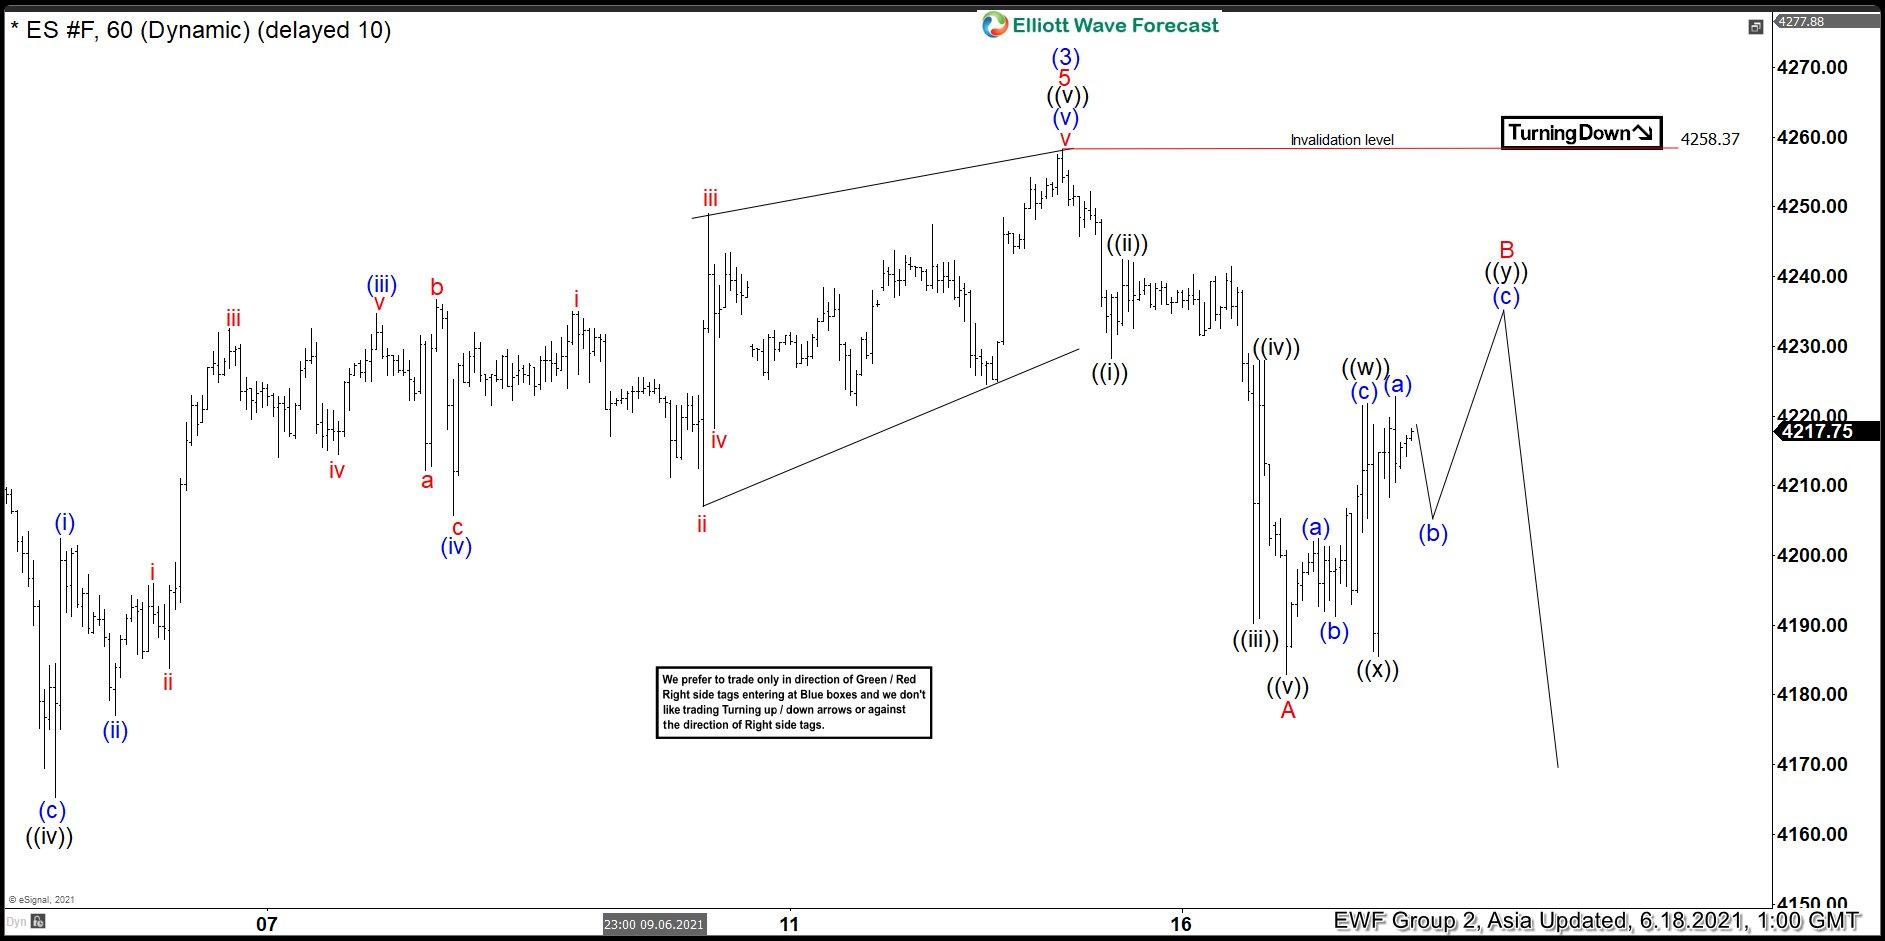 S&P 500 E-Mini (ES) Elliott Wave Chart